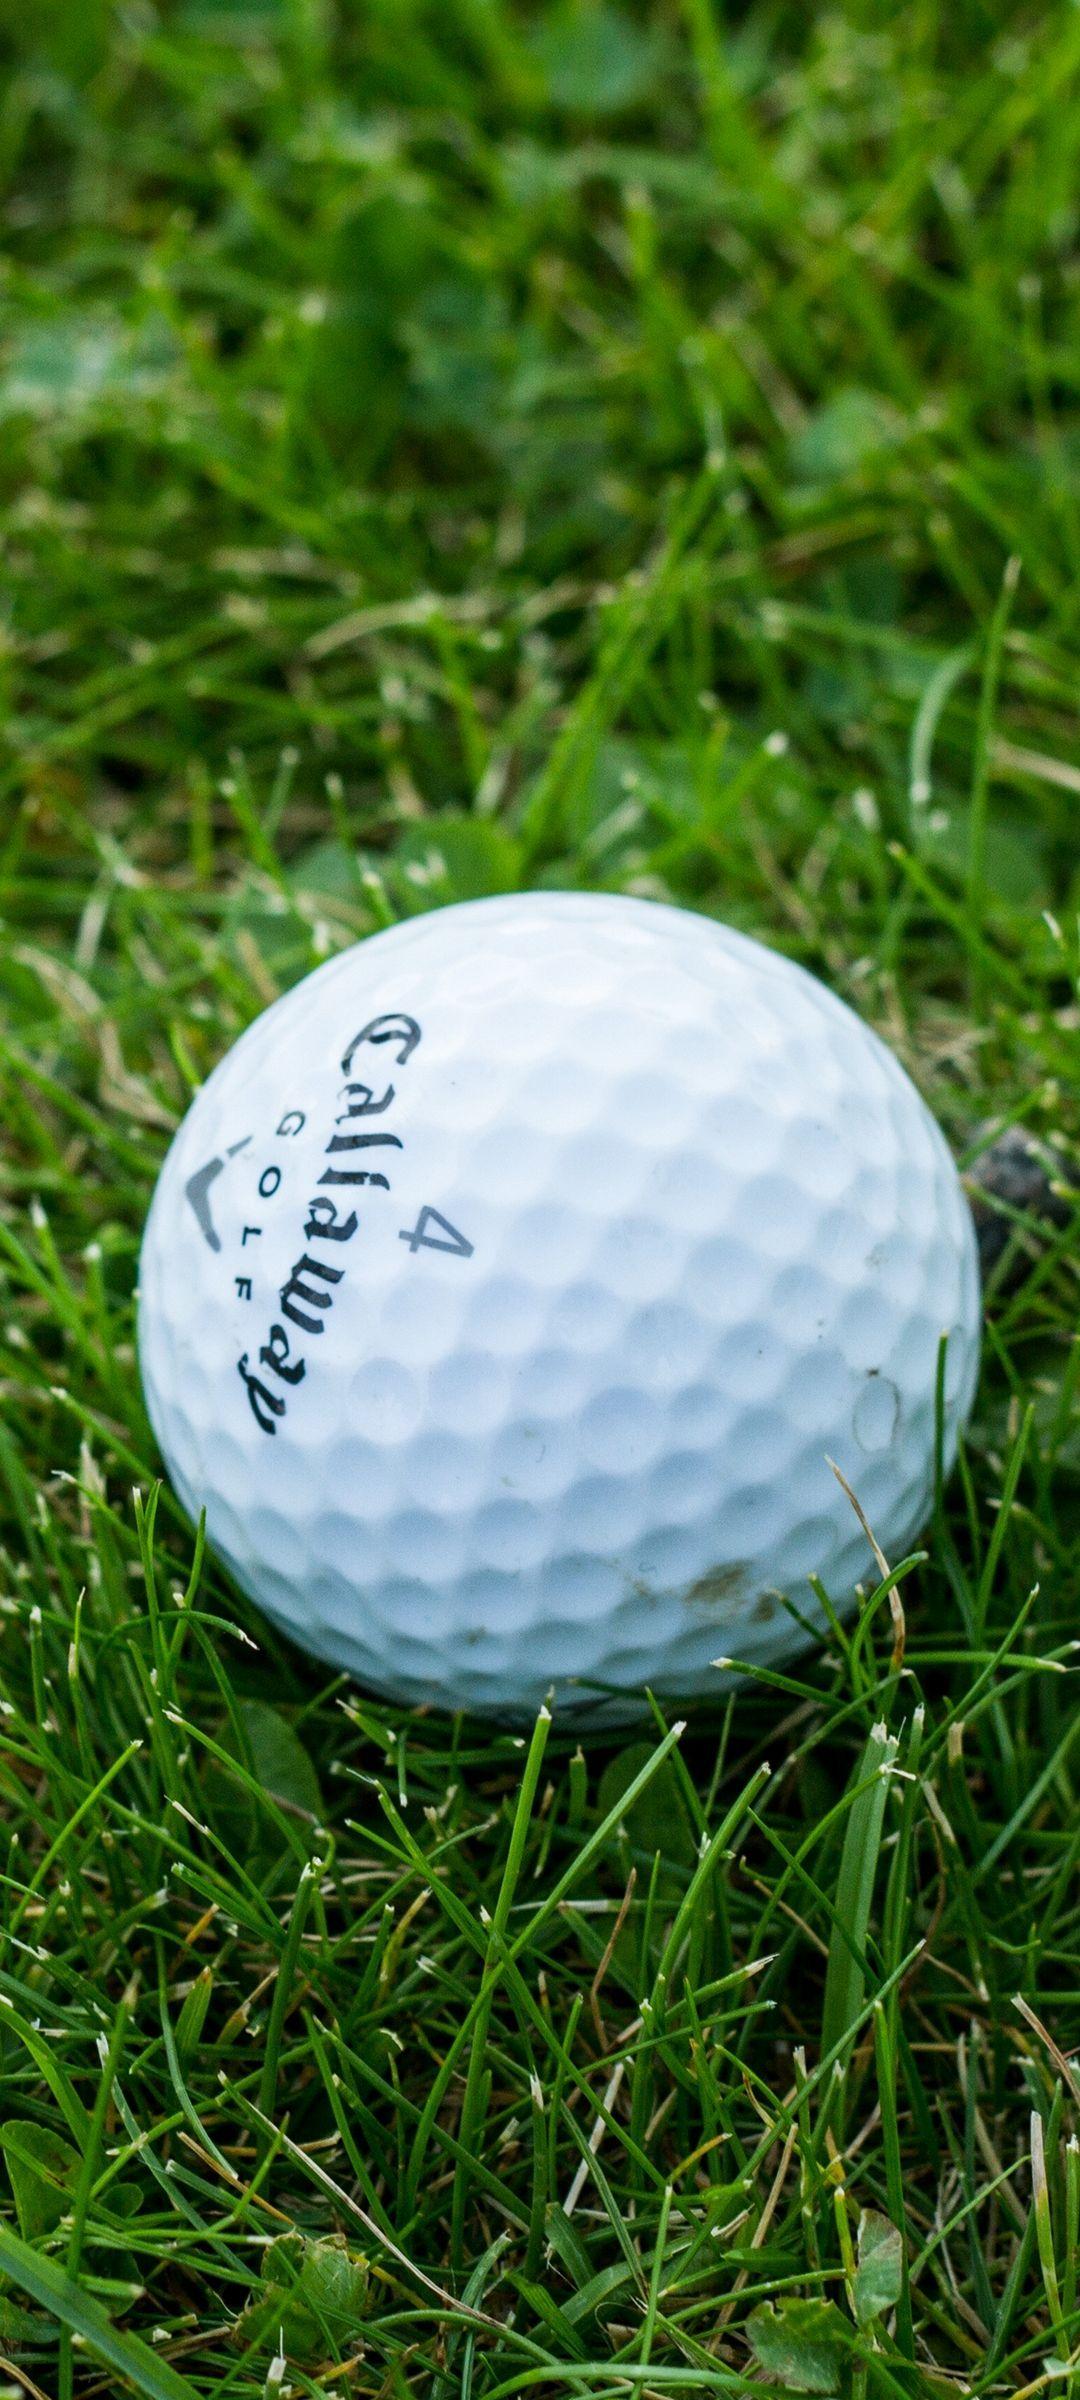 Samsung Galaxy A70 Wallpapers Golf Ball Golf Samsung Galaxy